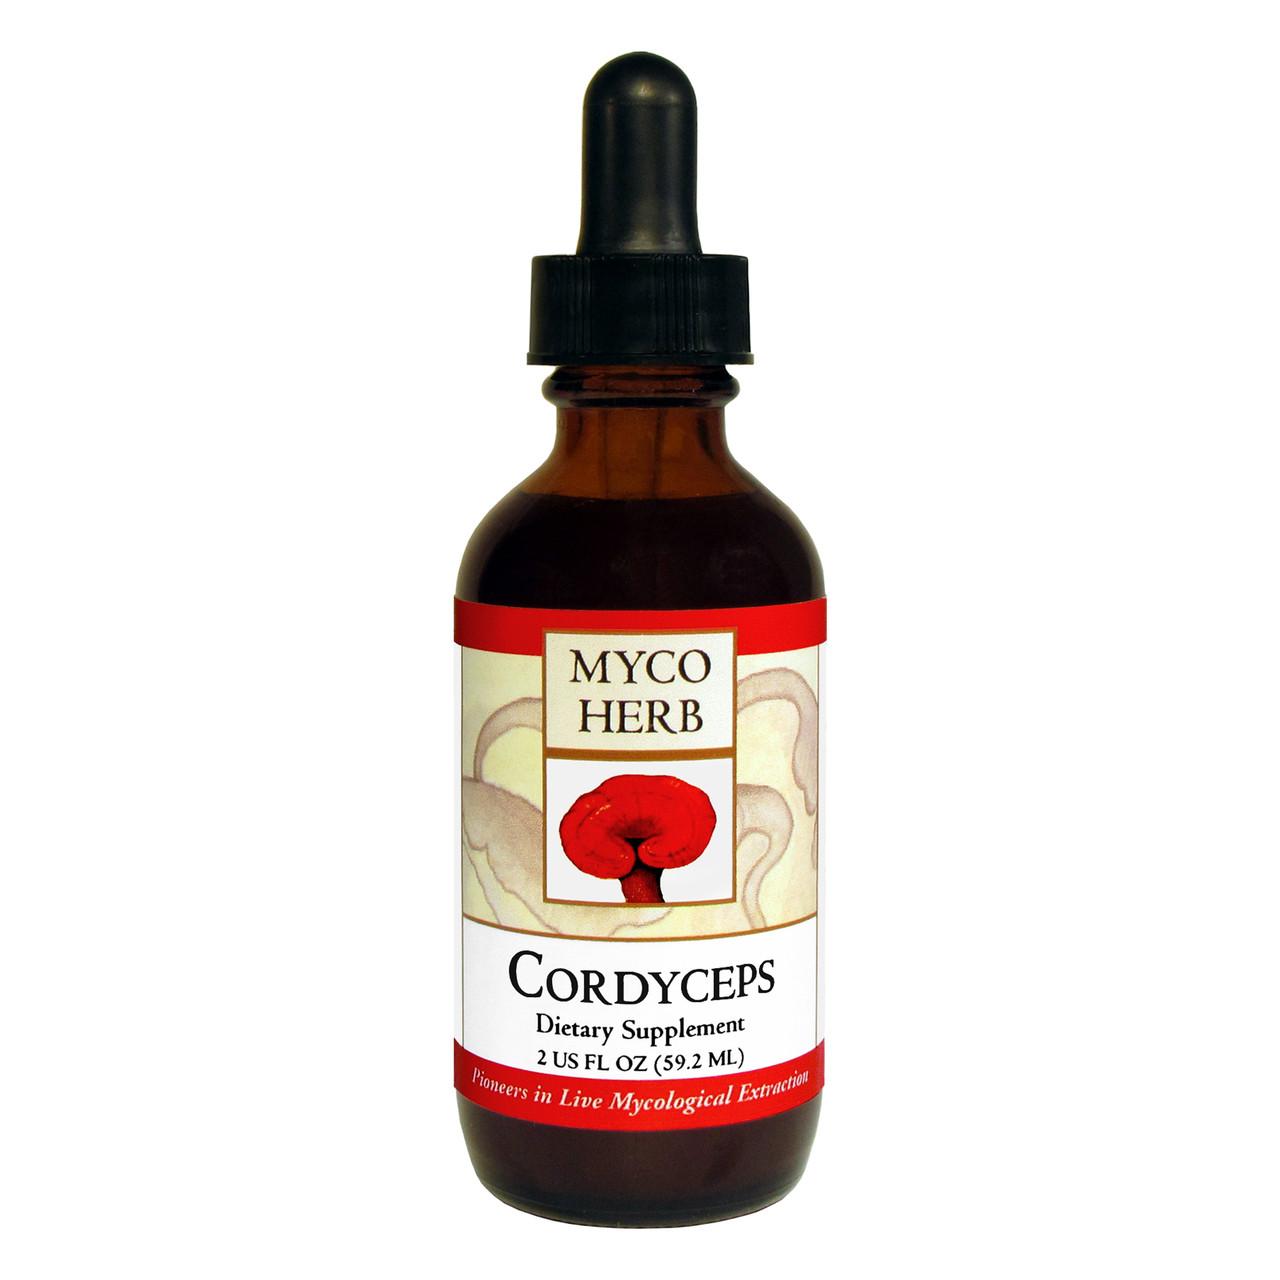 MycoHerb by Kan Cordyceps 2 oz